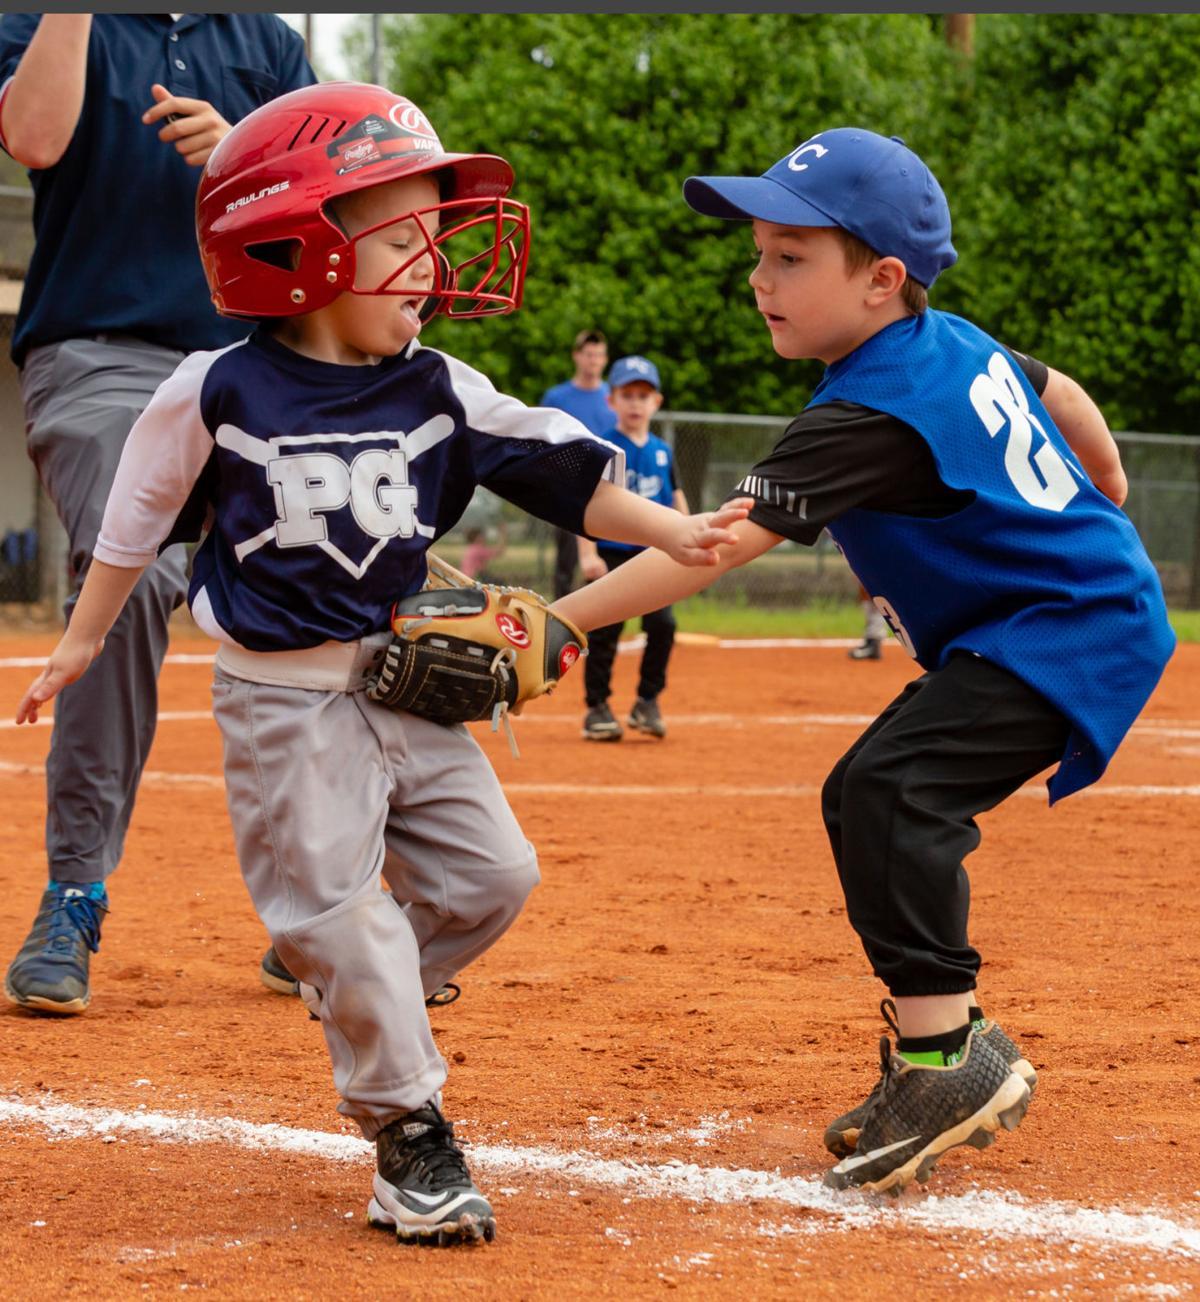 18 sports-youth sports web photo page1.jpg